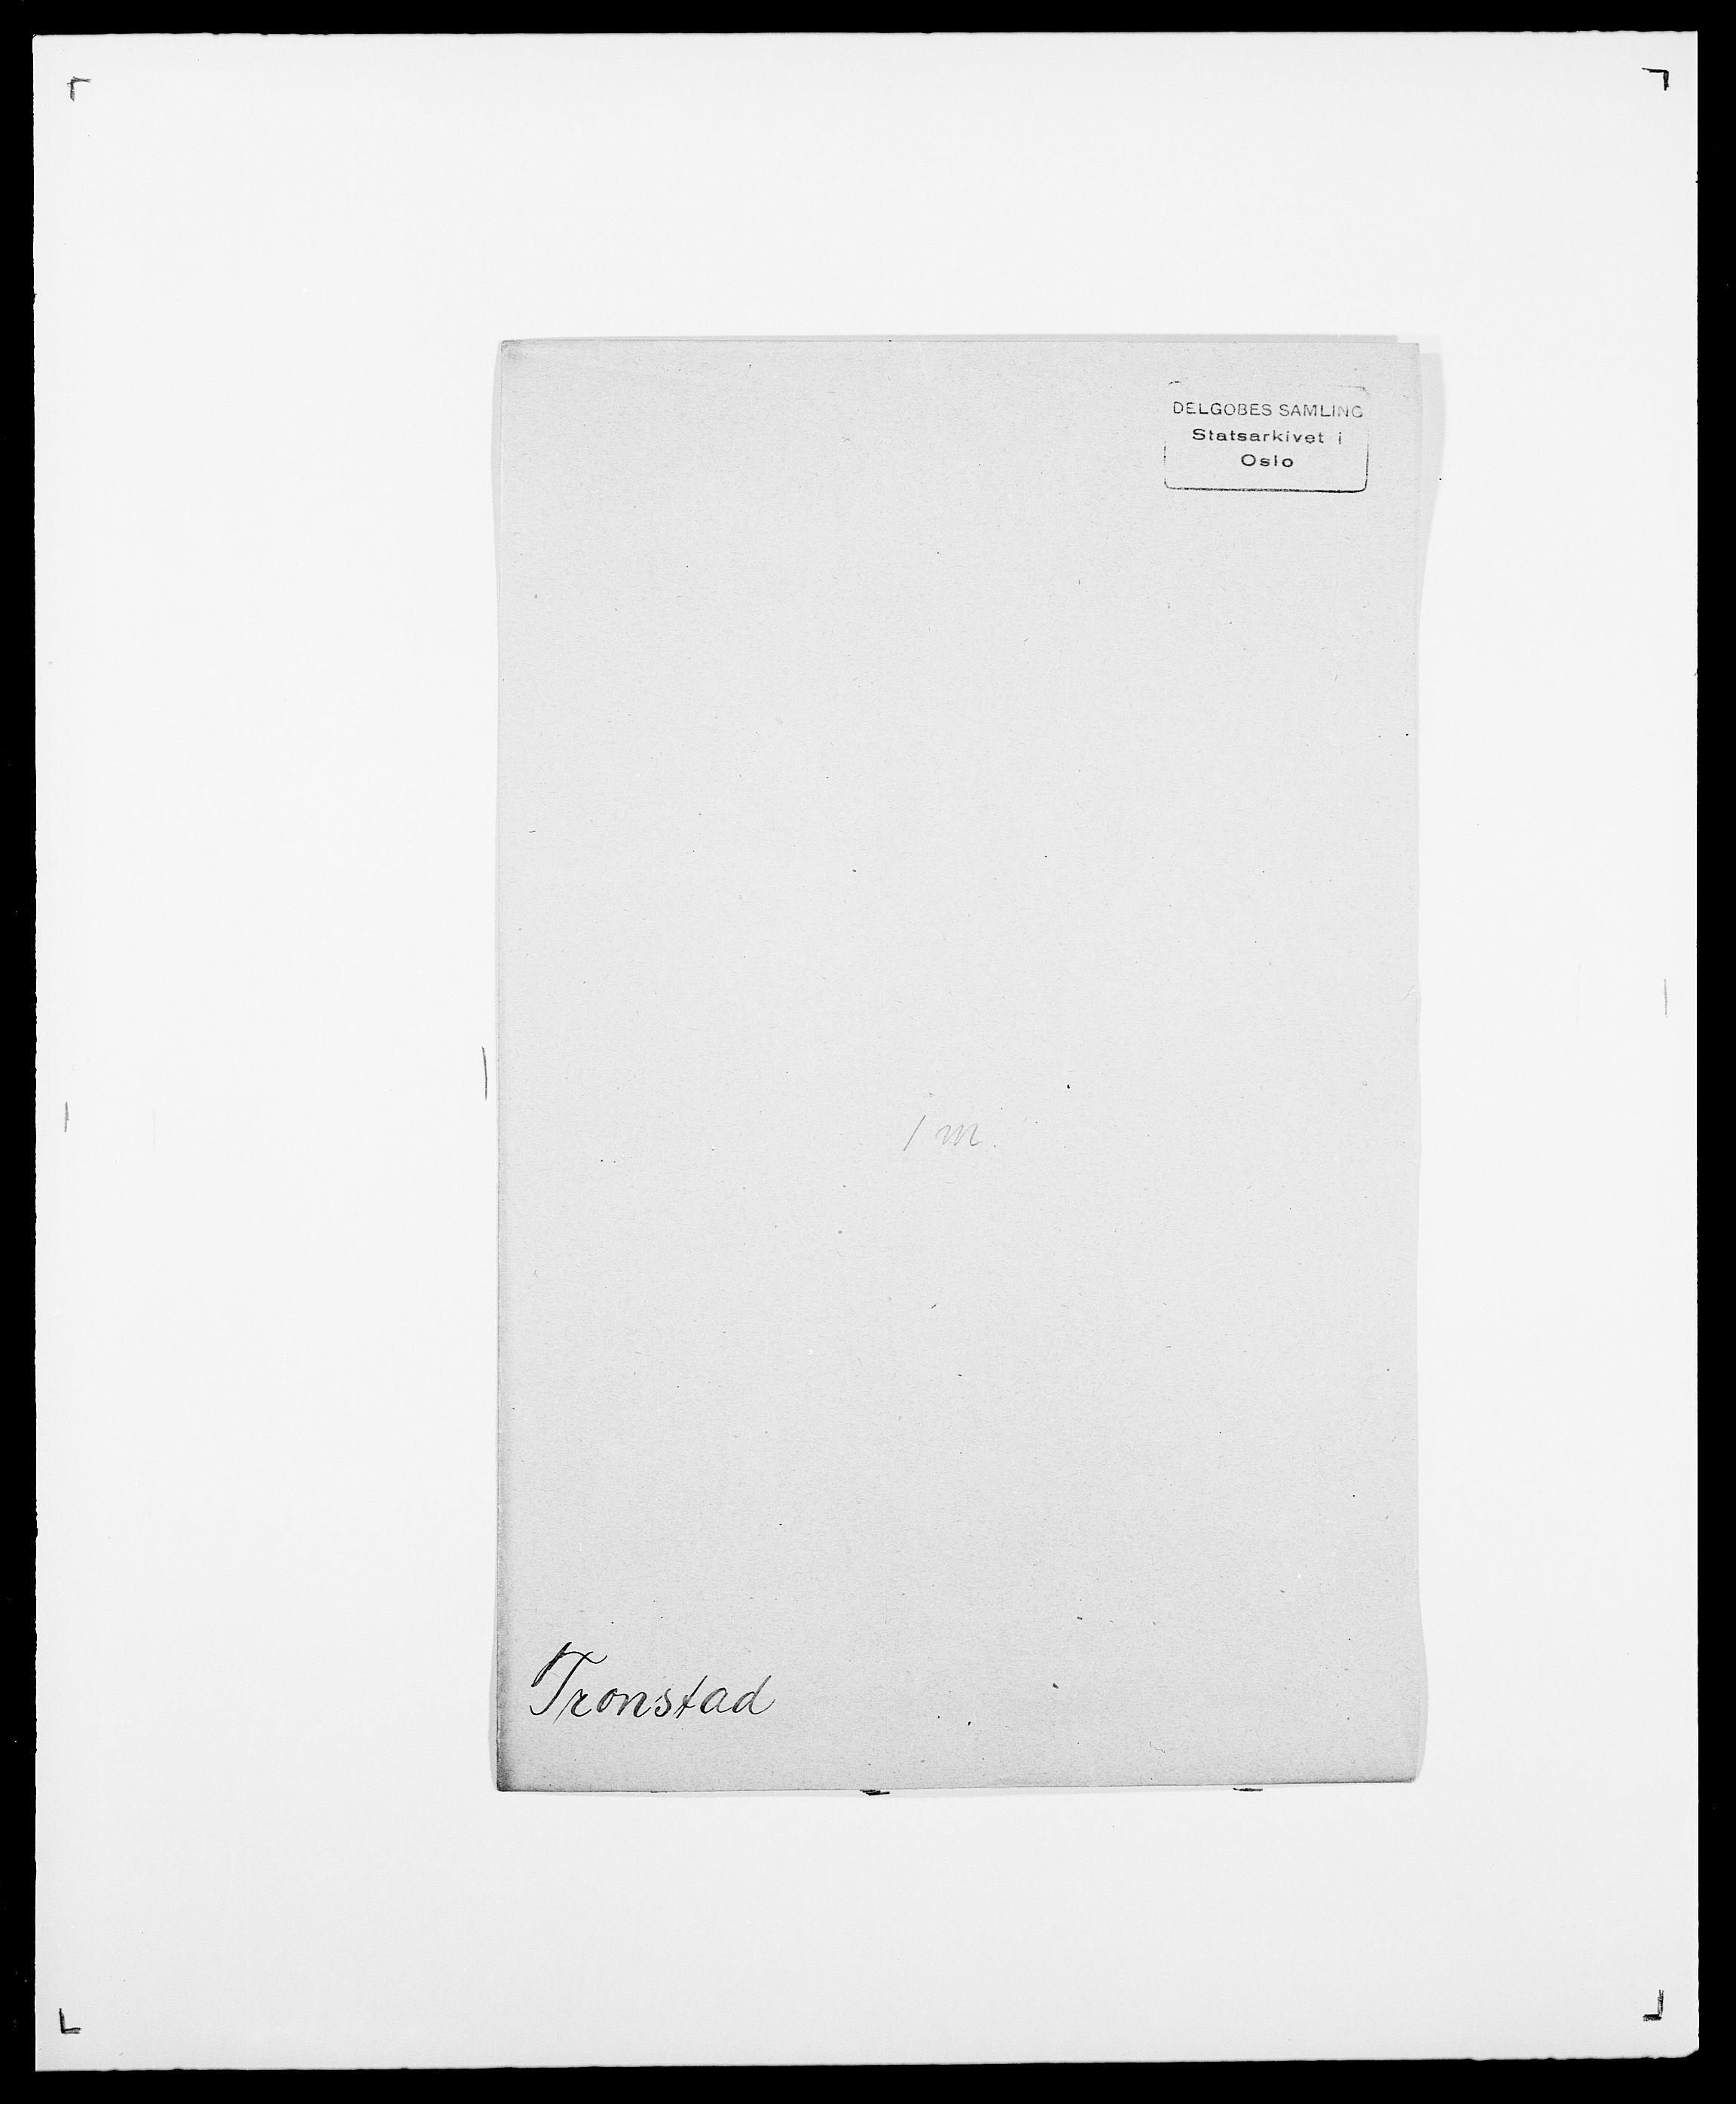 SAO, Delgobe, Charles Antoine - samling, D/Da/L0039: Thorsen - Urup, s. 387